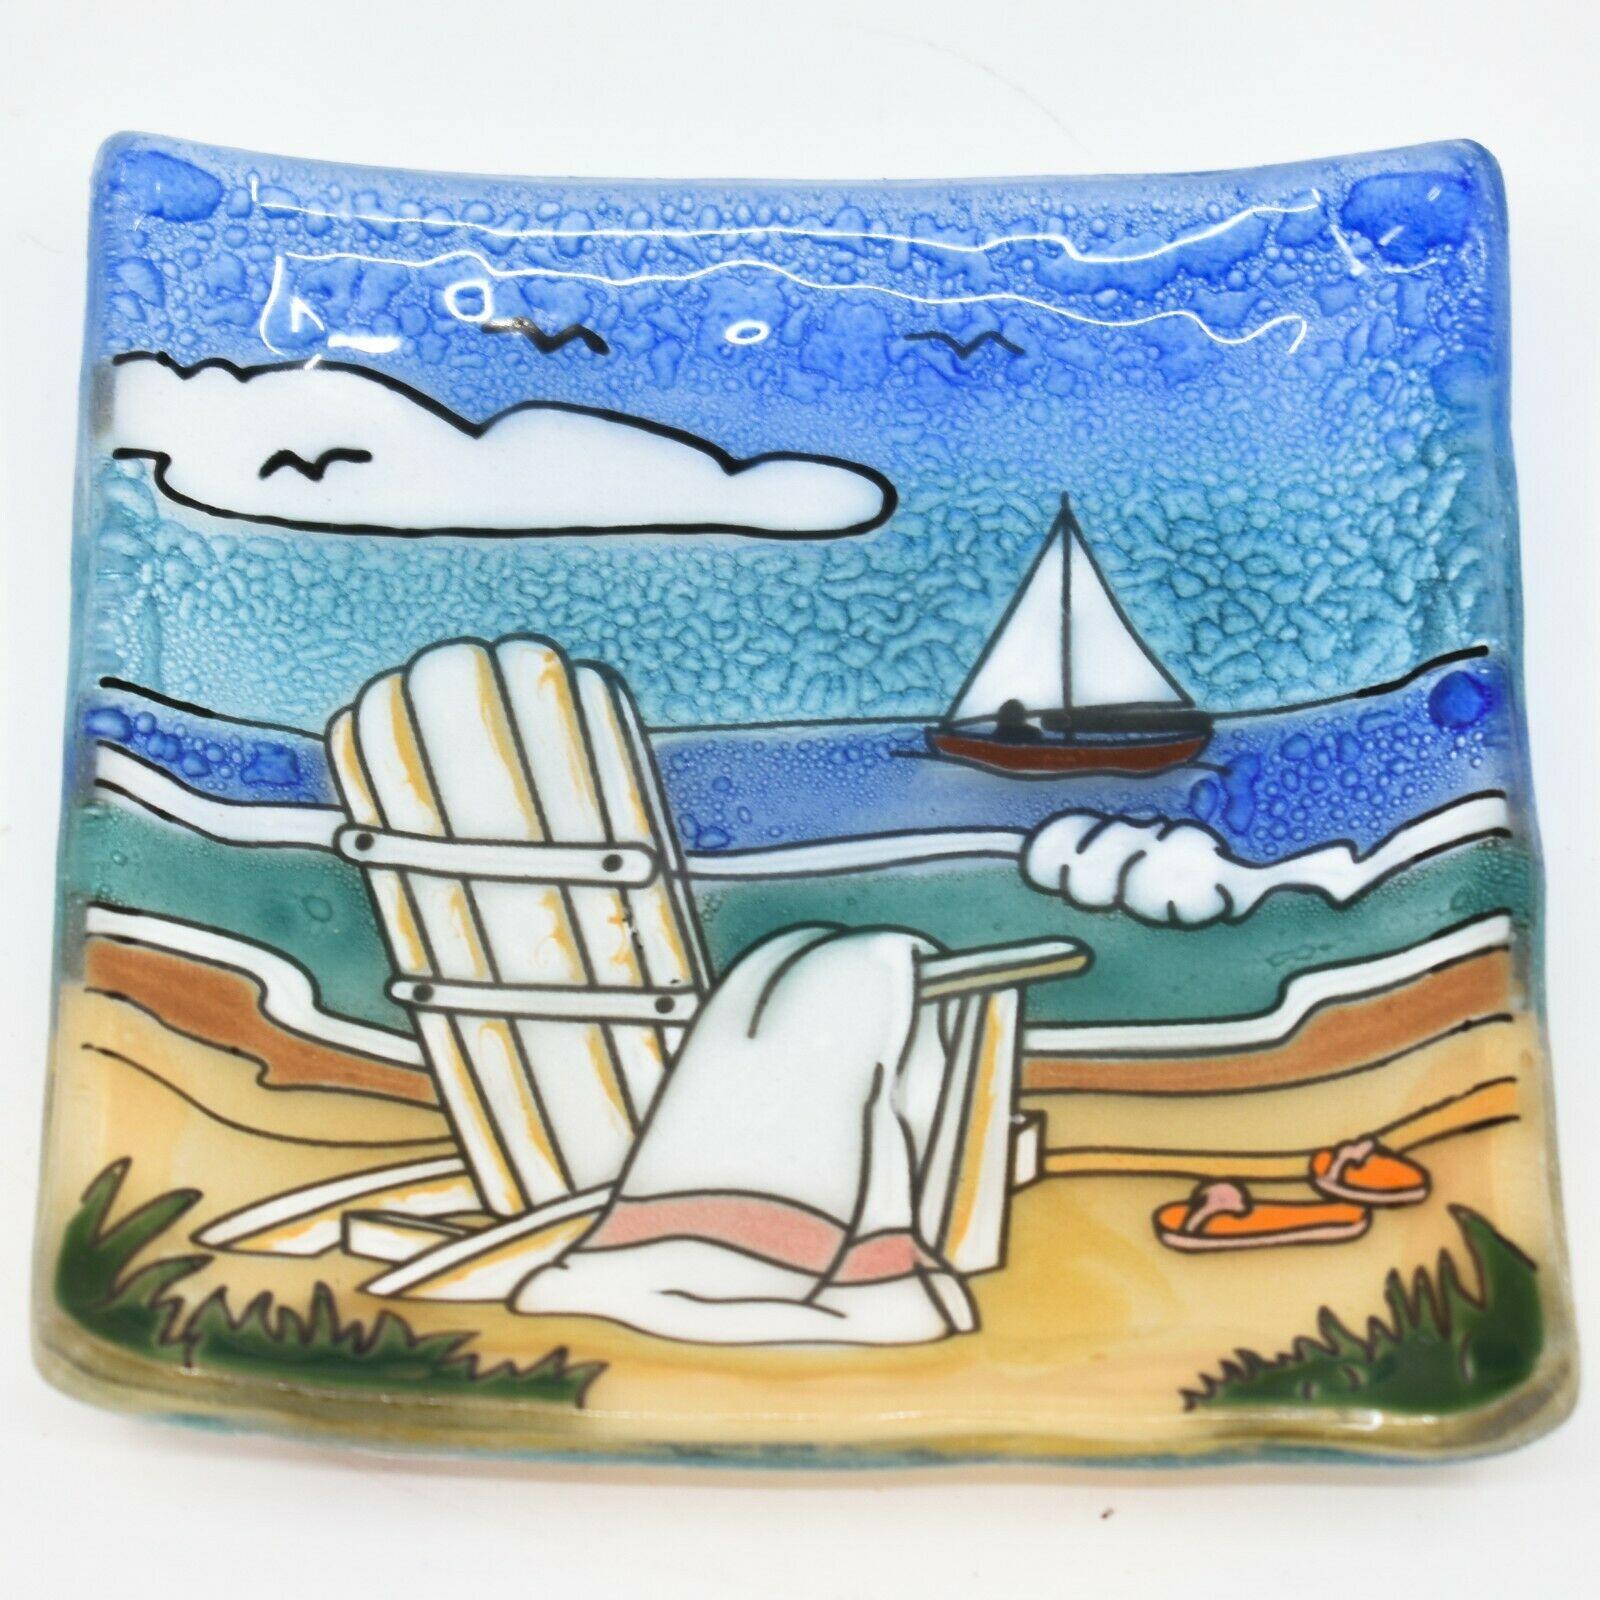 Fused Art Glass Adirondack Chair Summer Beach Design Soap Dish Handmade Ecuador